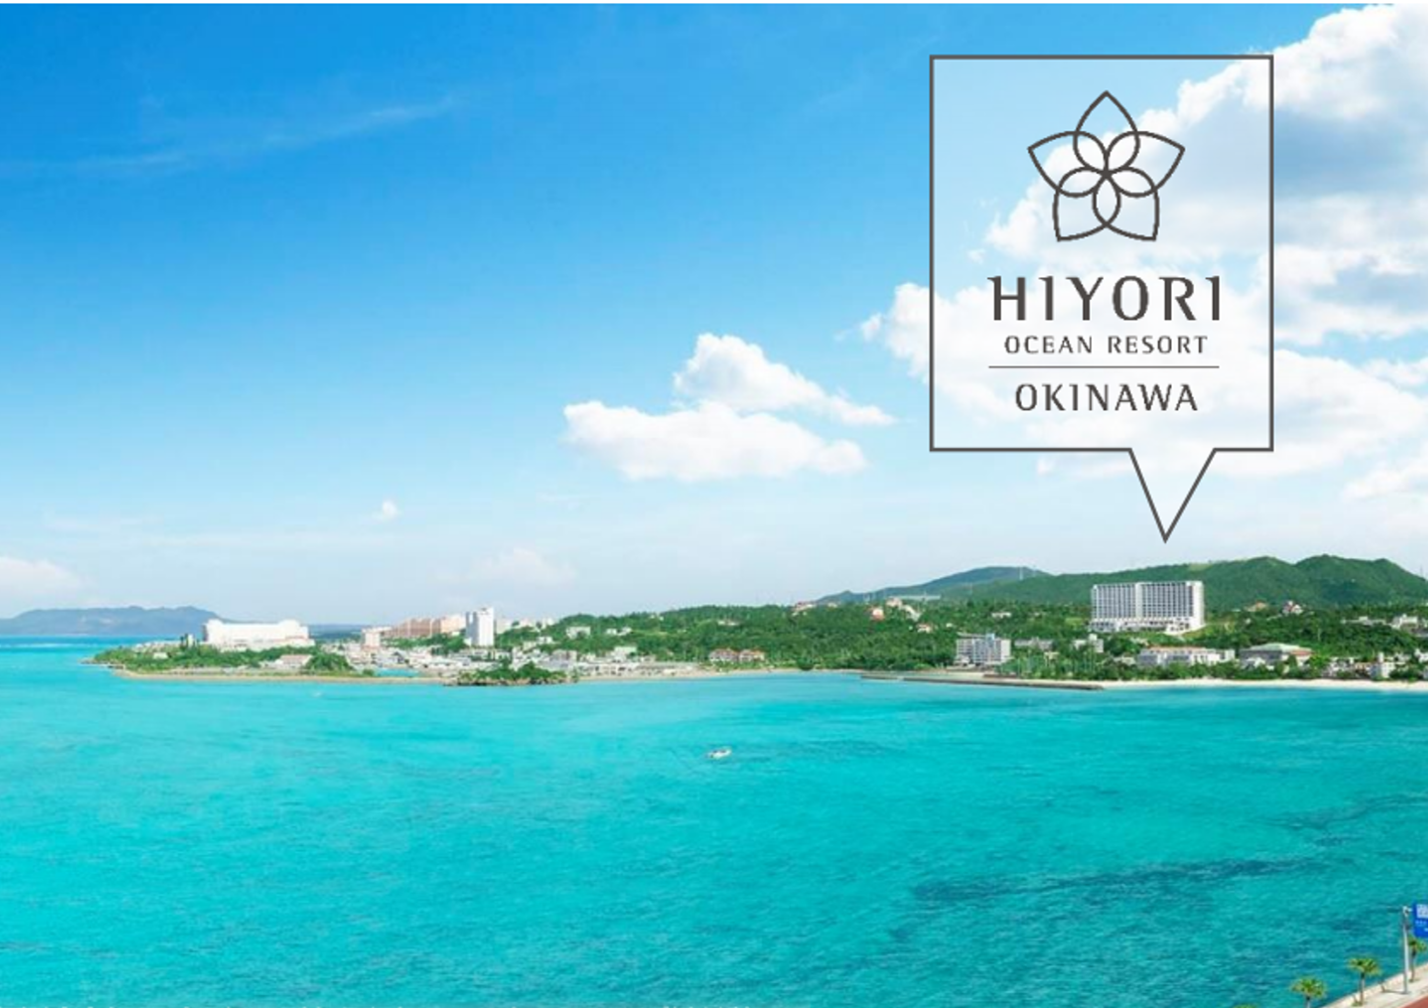 「 HIYORI オーシャンリゾート沖縄 」2021 年 2 月 20 日(土)プレオープン